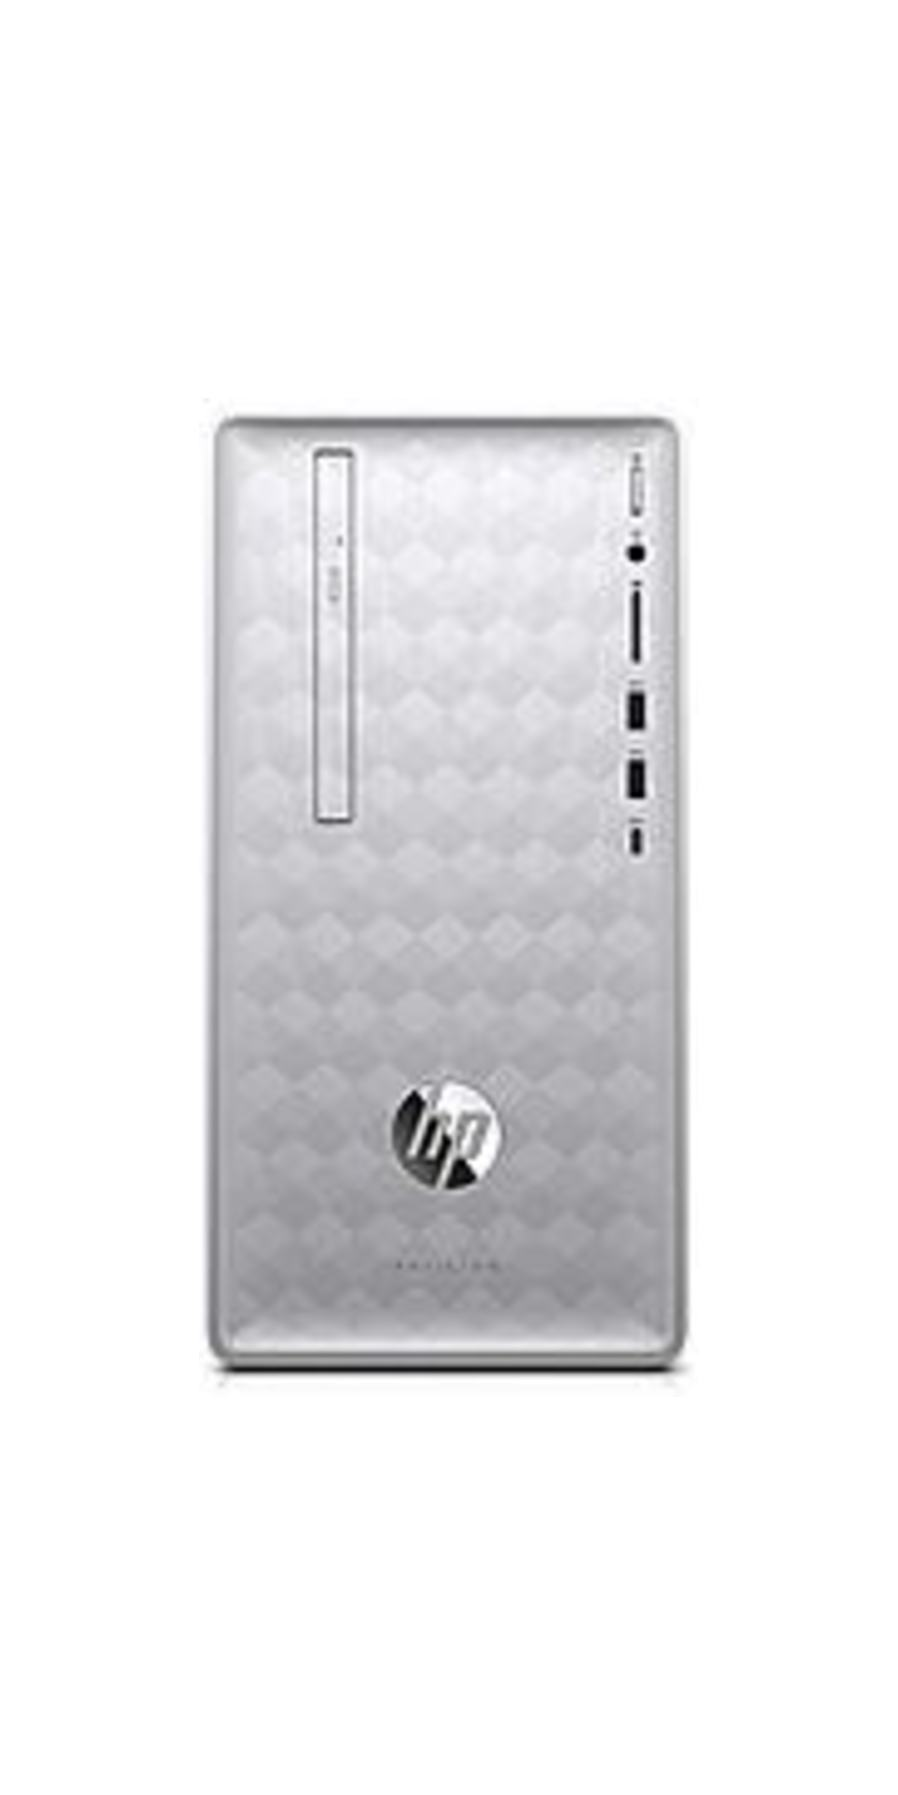 HP 3LA16AA PV90 Pavilion Desktop PC - Intel Core i5-8400 2.8 GHz Six-Core Processor - 8 GB DDR4 SDRAM - 1 TB Hard Drive - 16 GB Optane Memory - Window